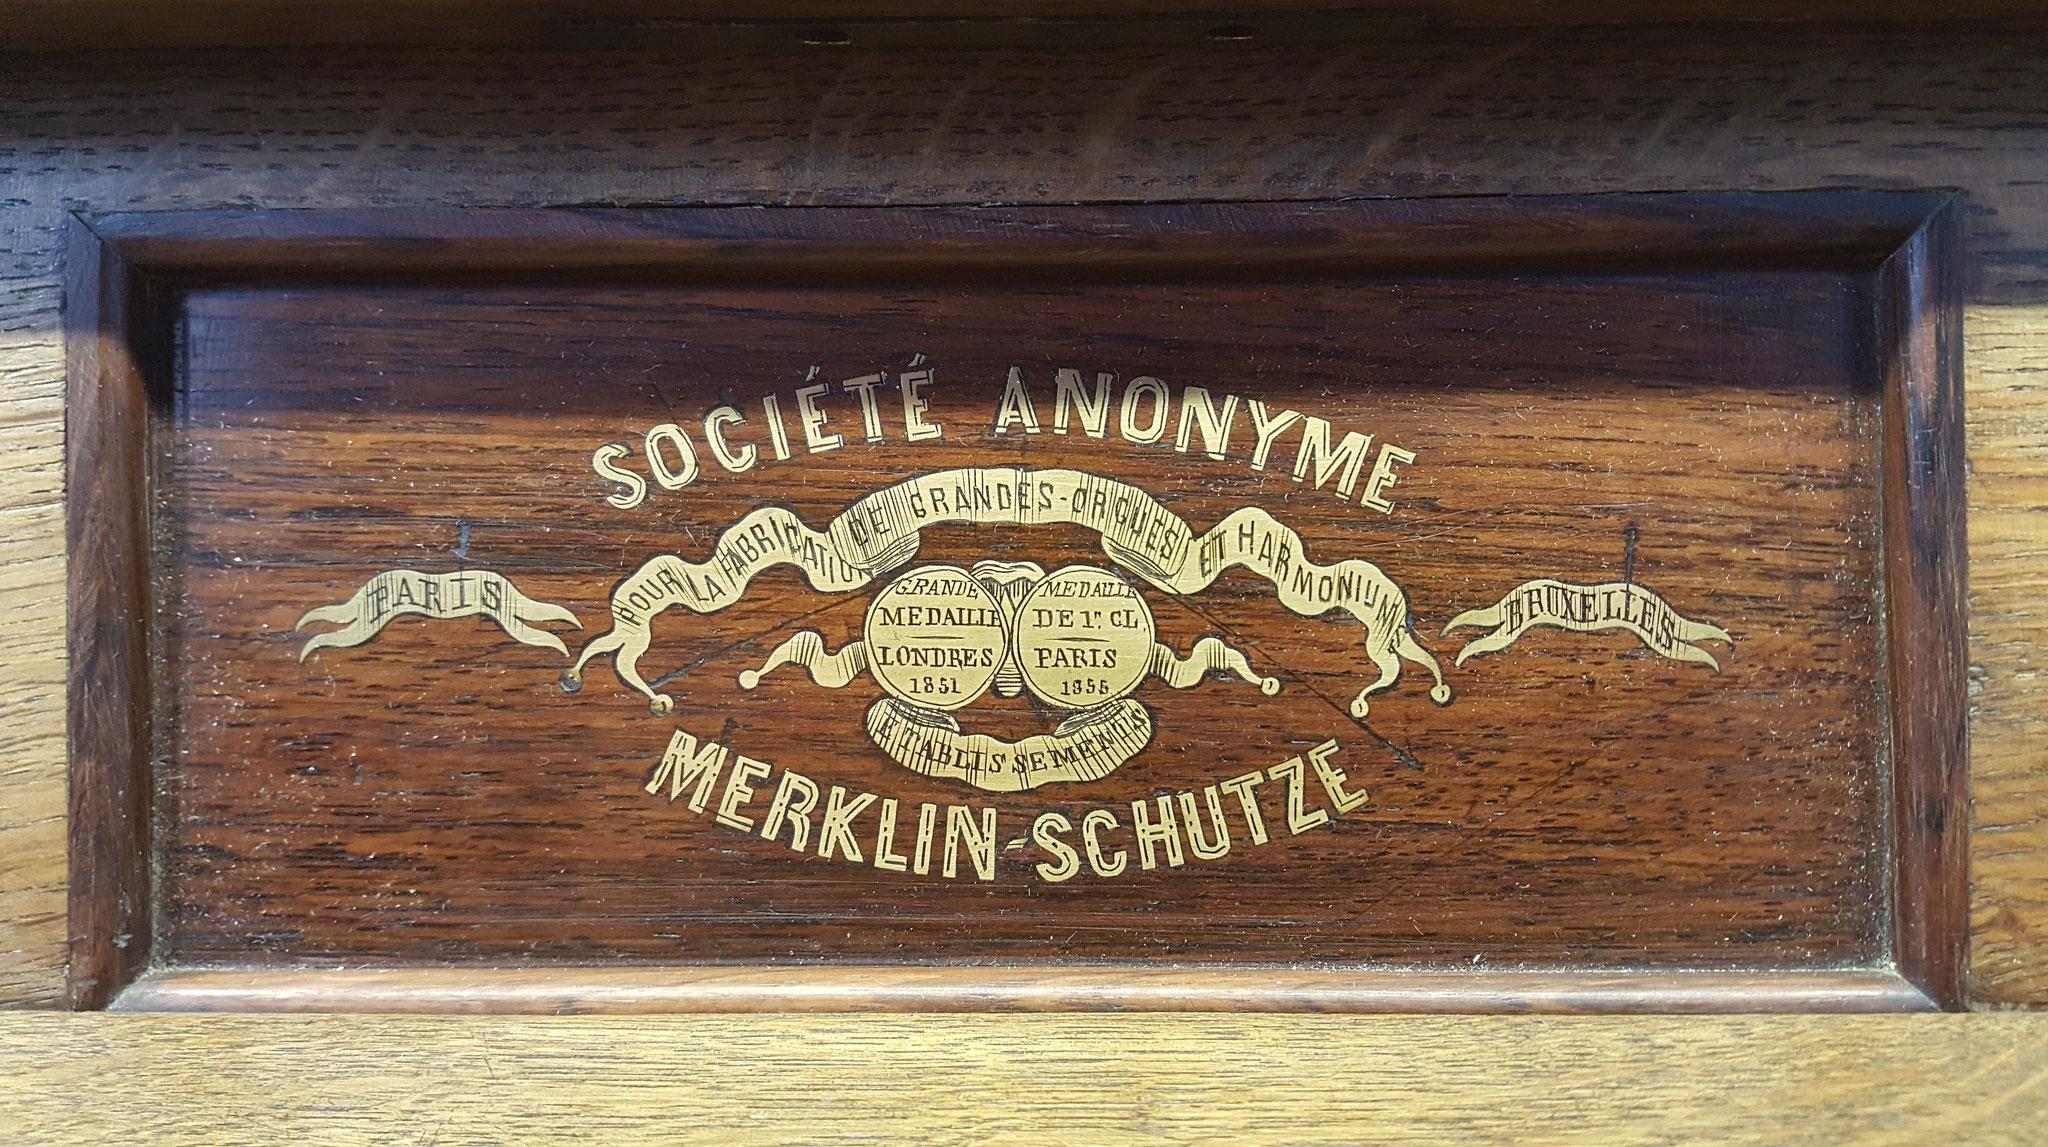 Manufacture Merklin-Schütze